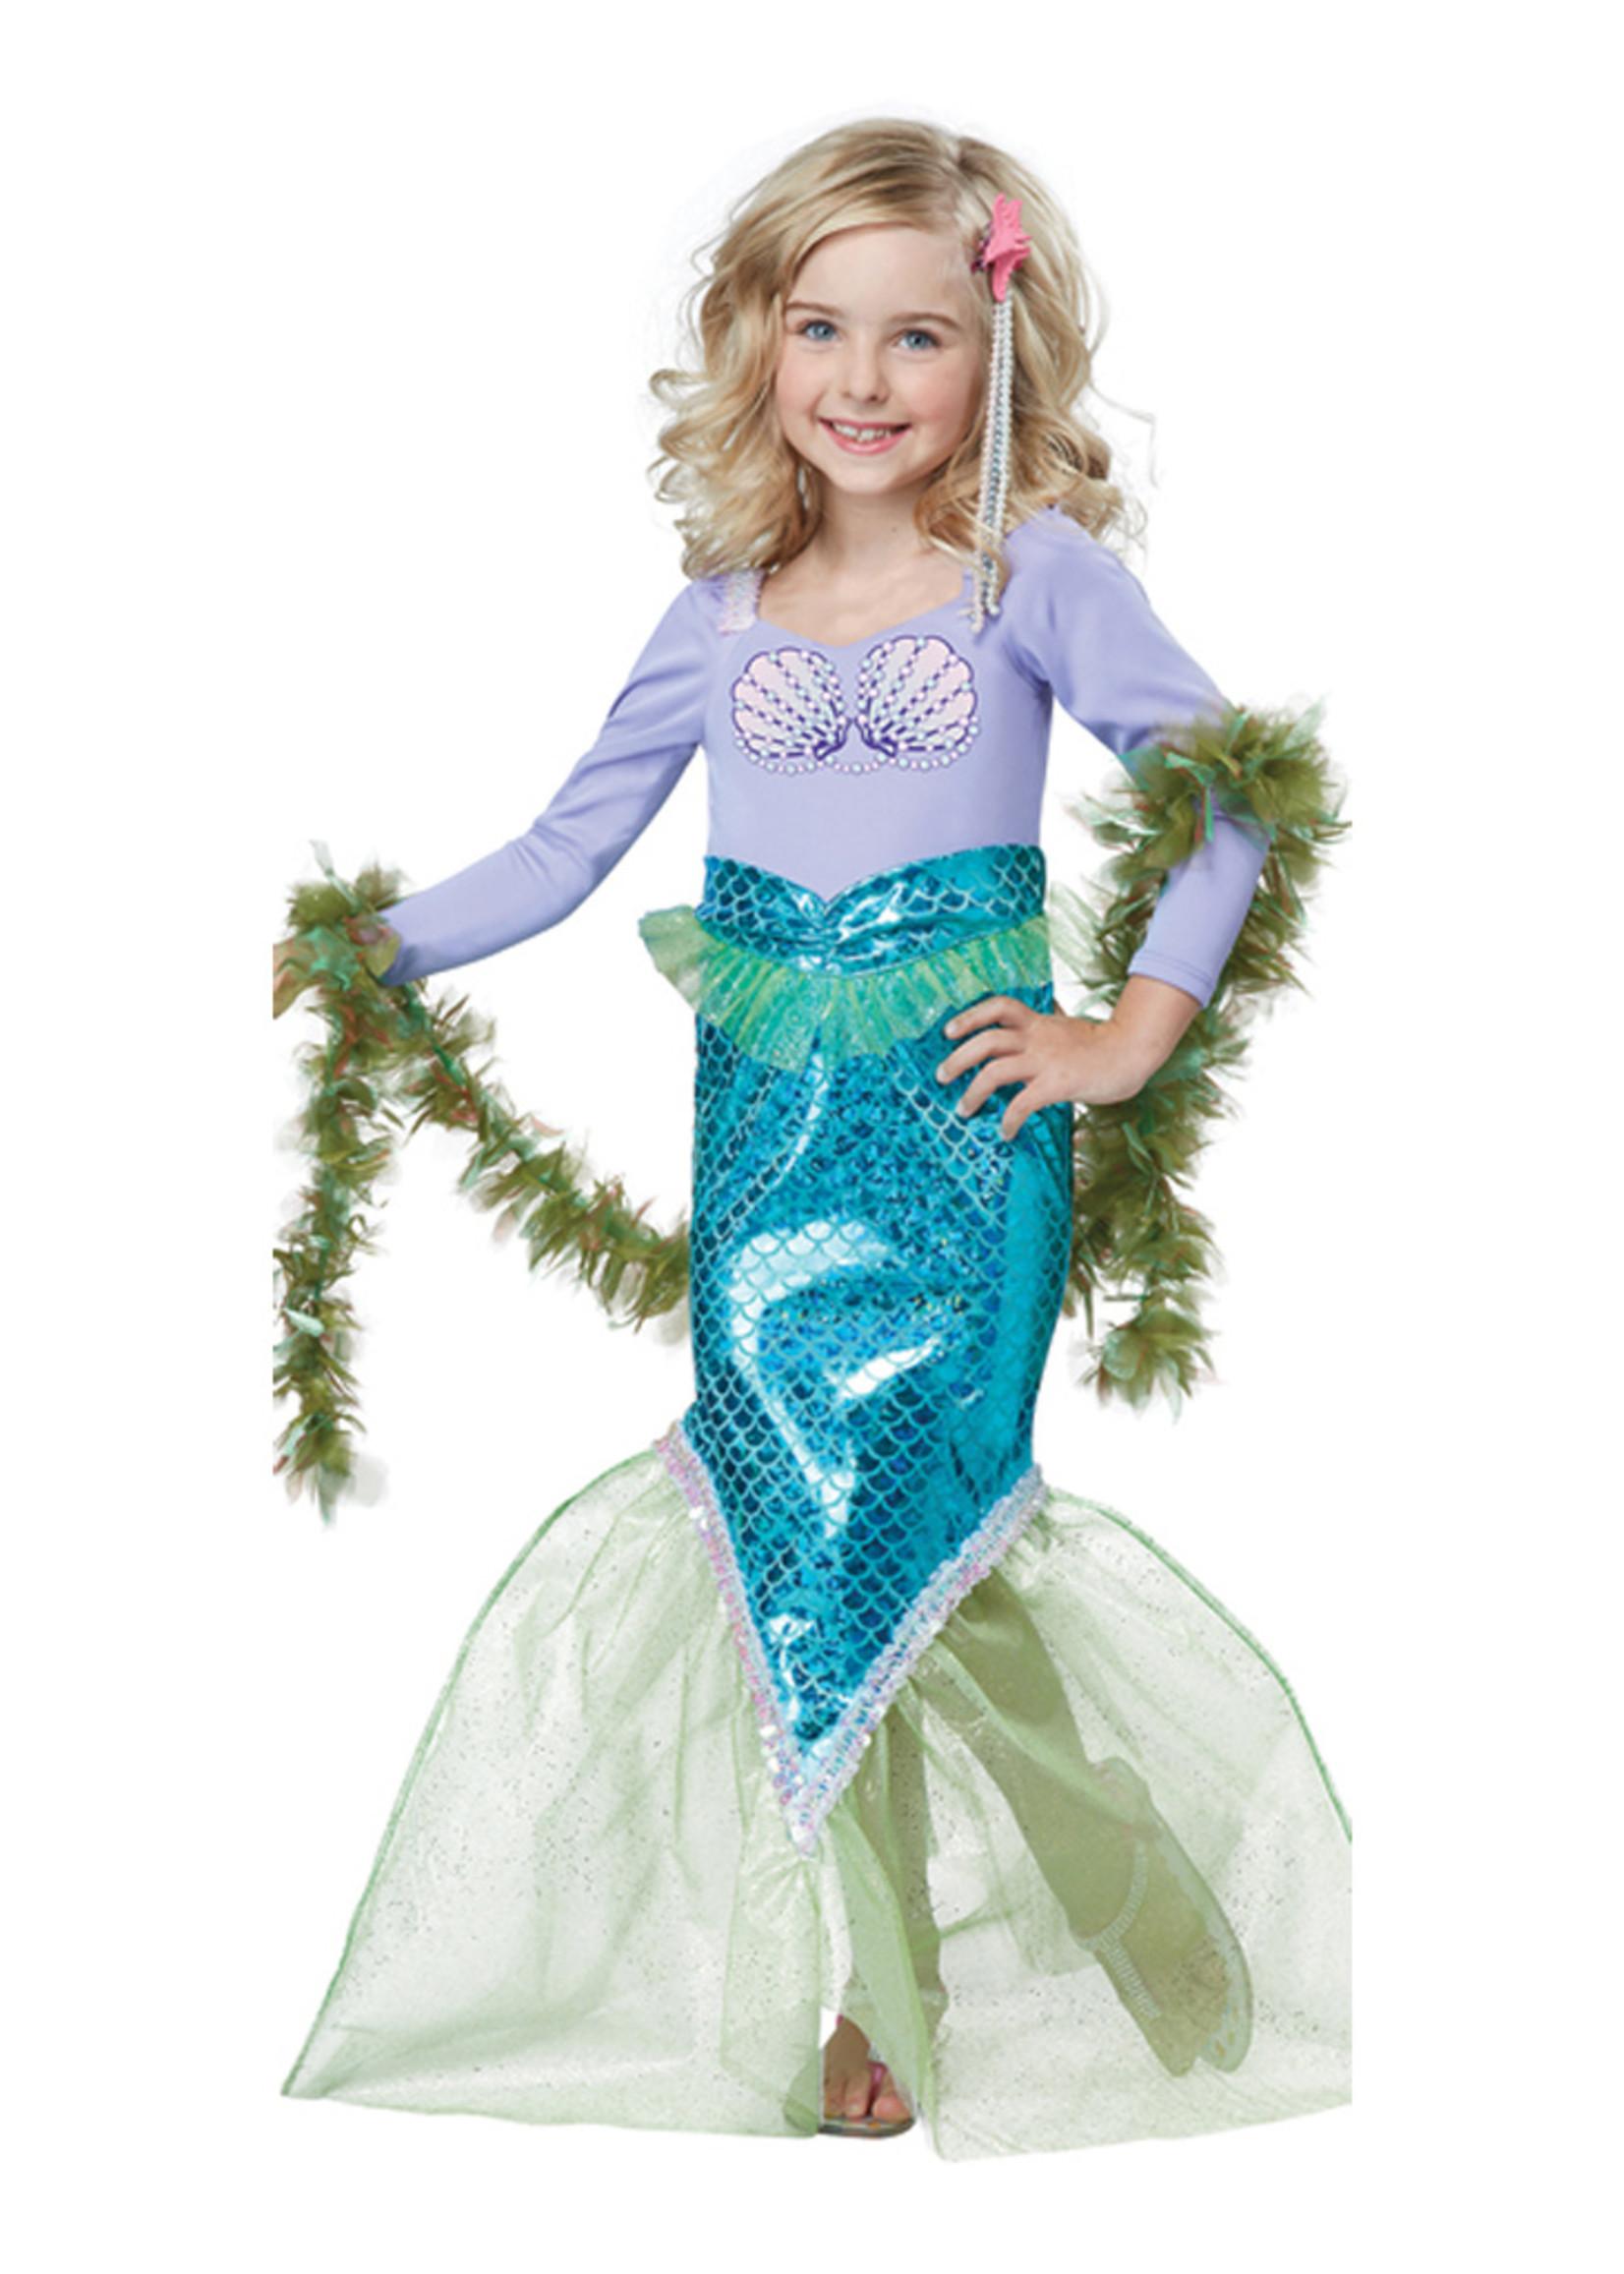 Magical Mermaid Costume - Girls